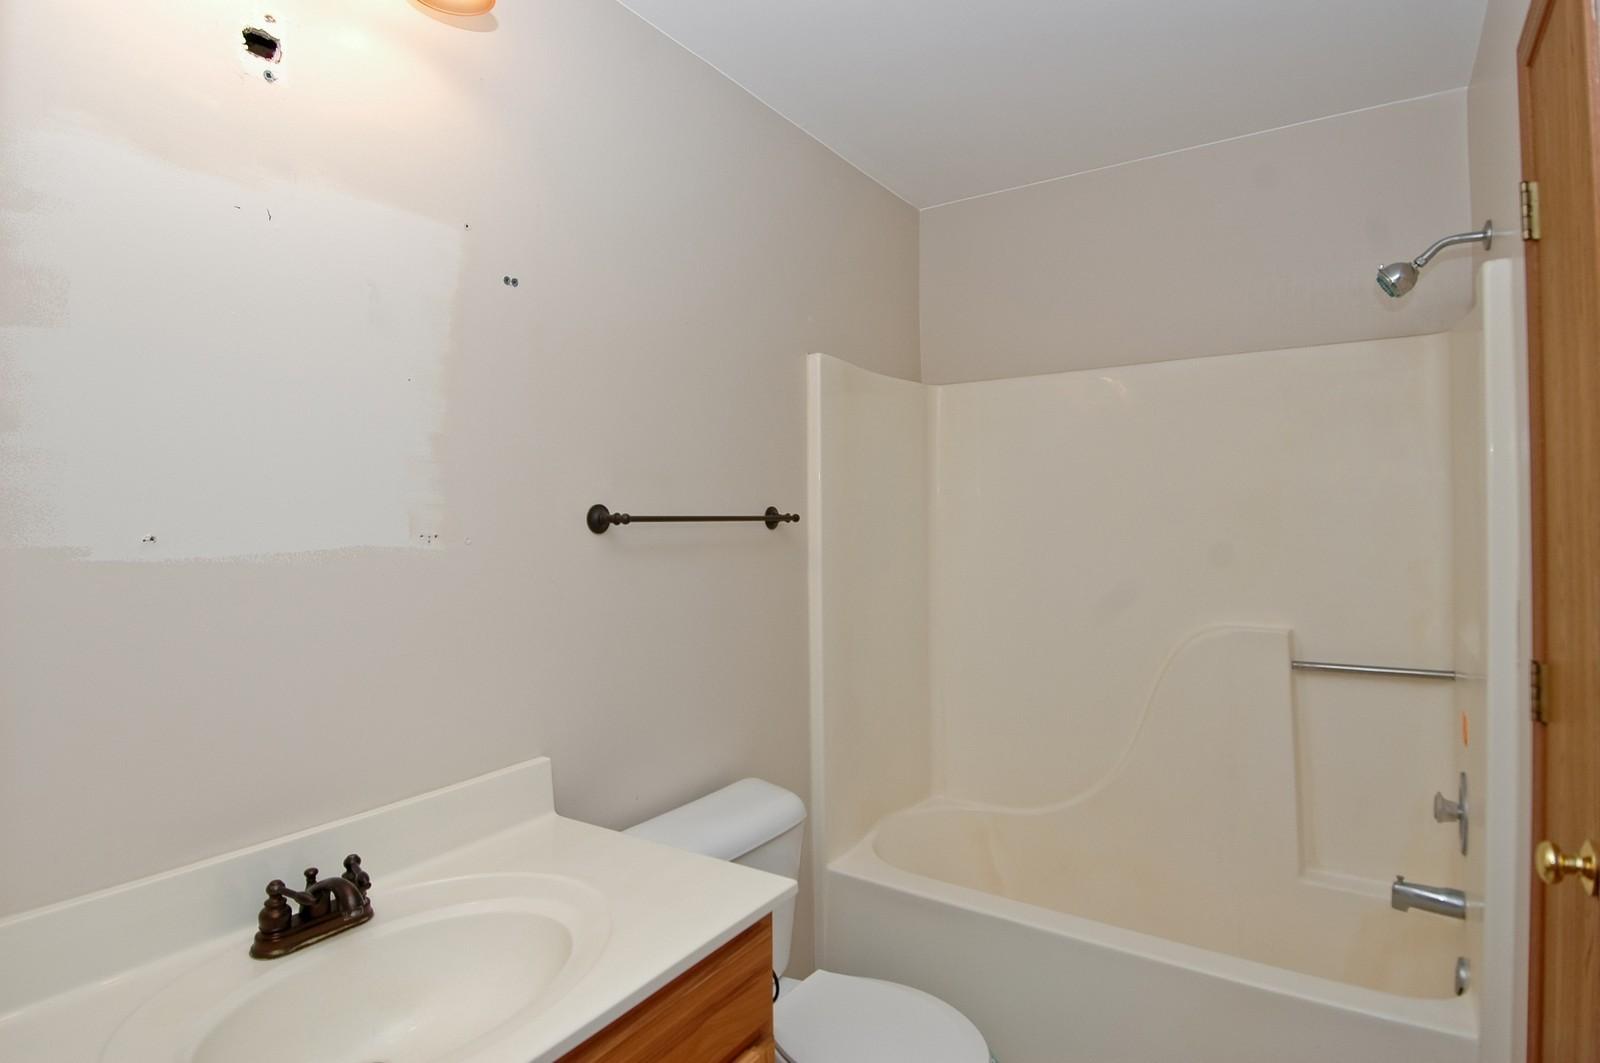 Real Estate Photography - 4314 Shamrock Ln, Unit 3B, McHenry, IL, 60050 - Bathroom